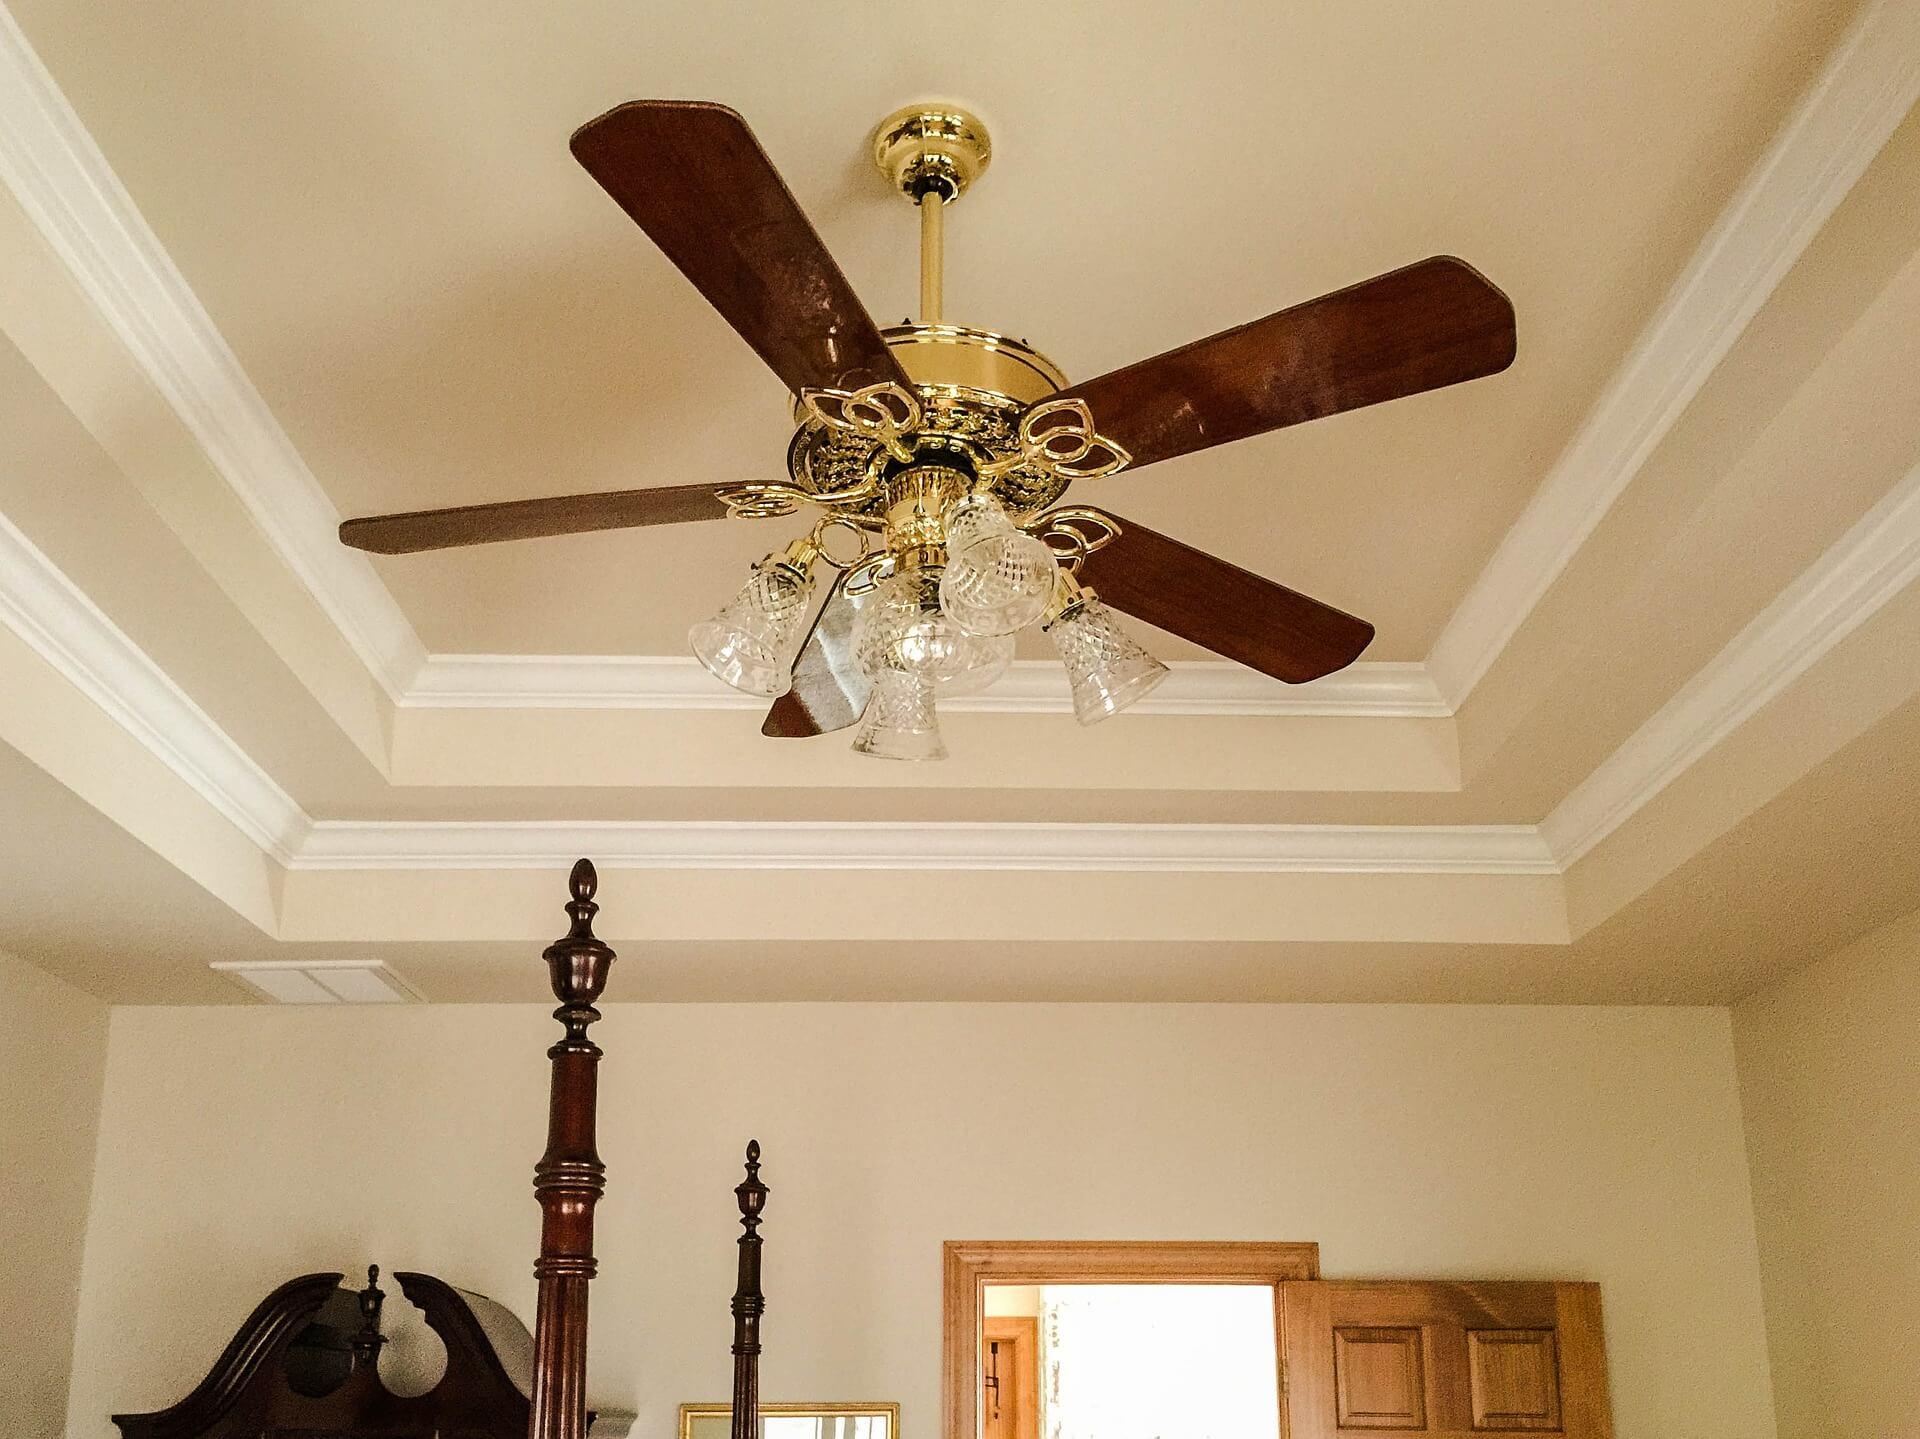 plafondventilator in de woonkamer